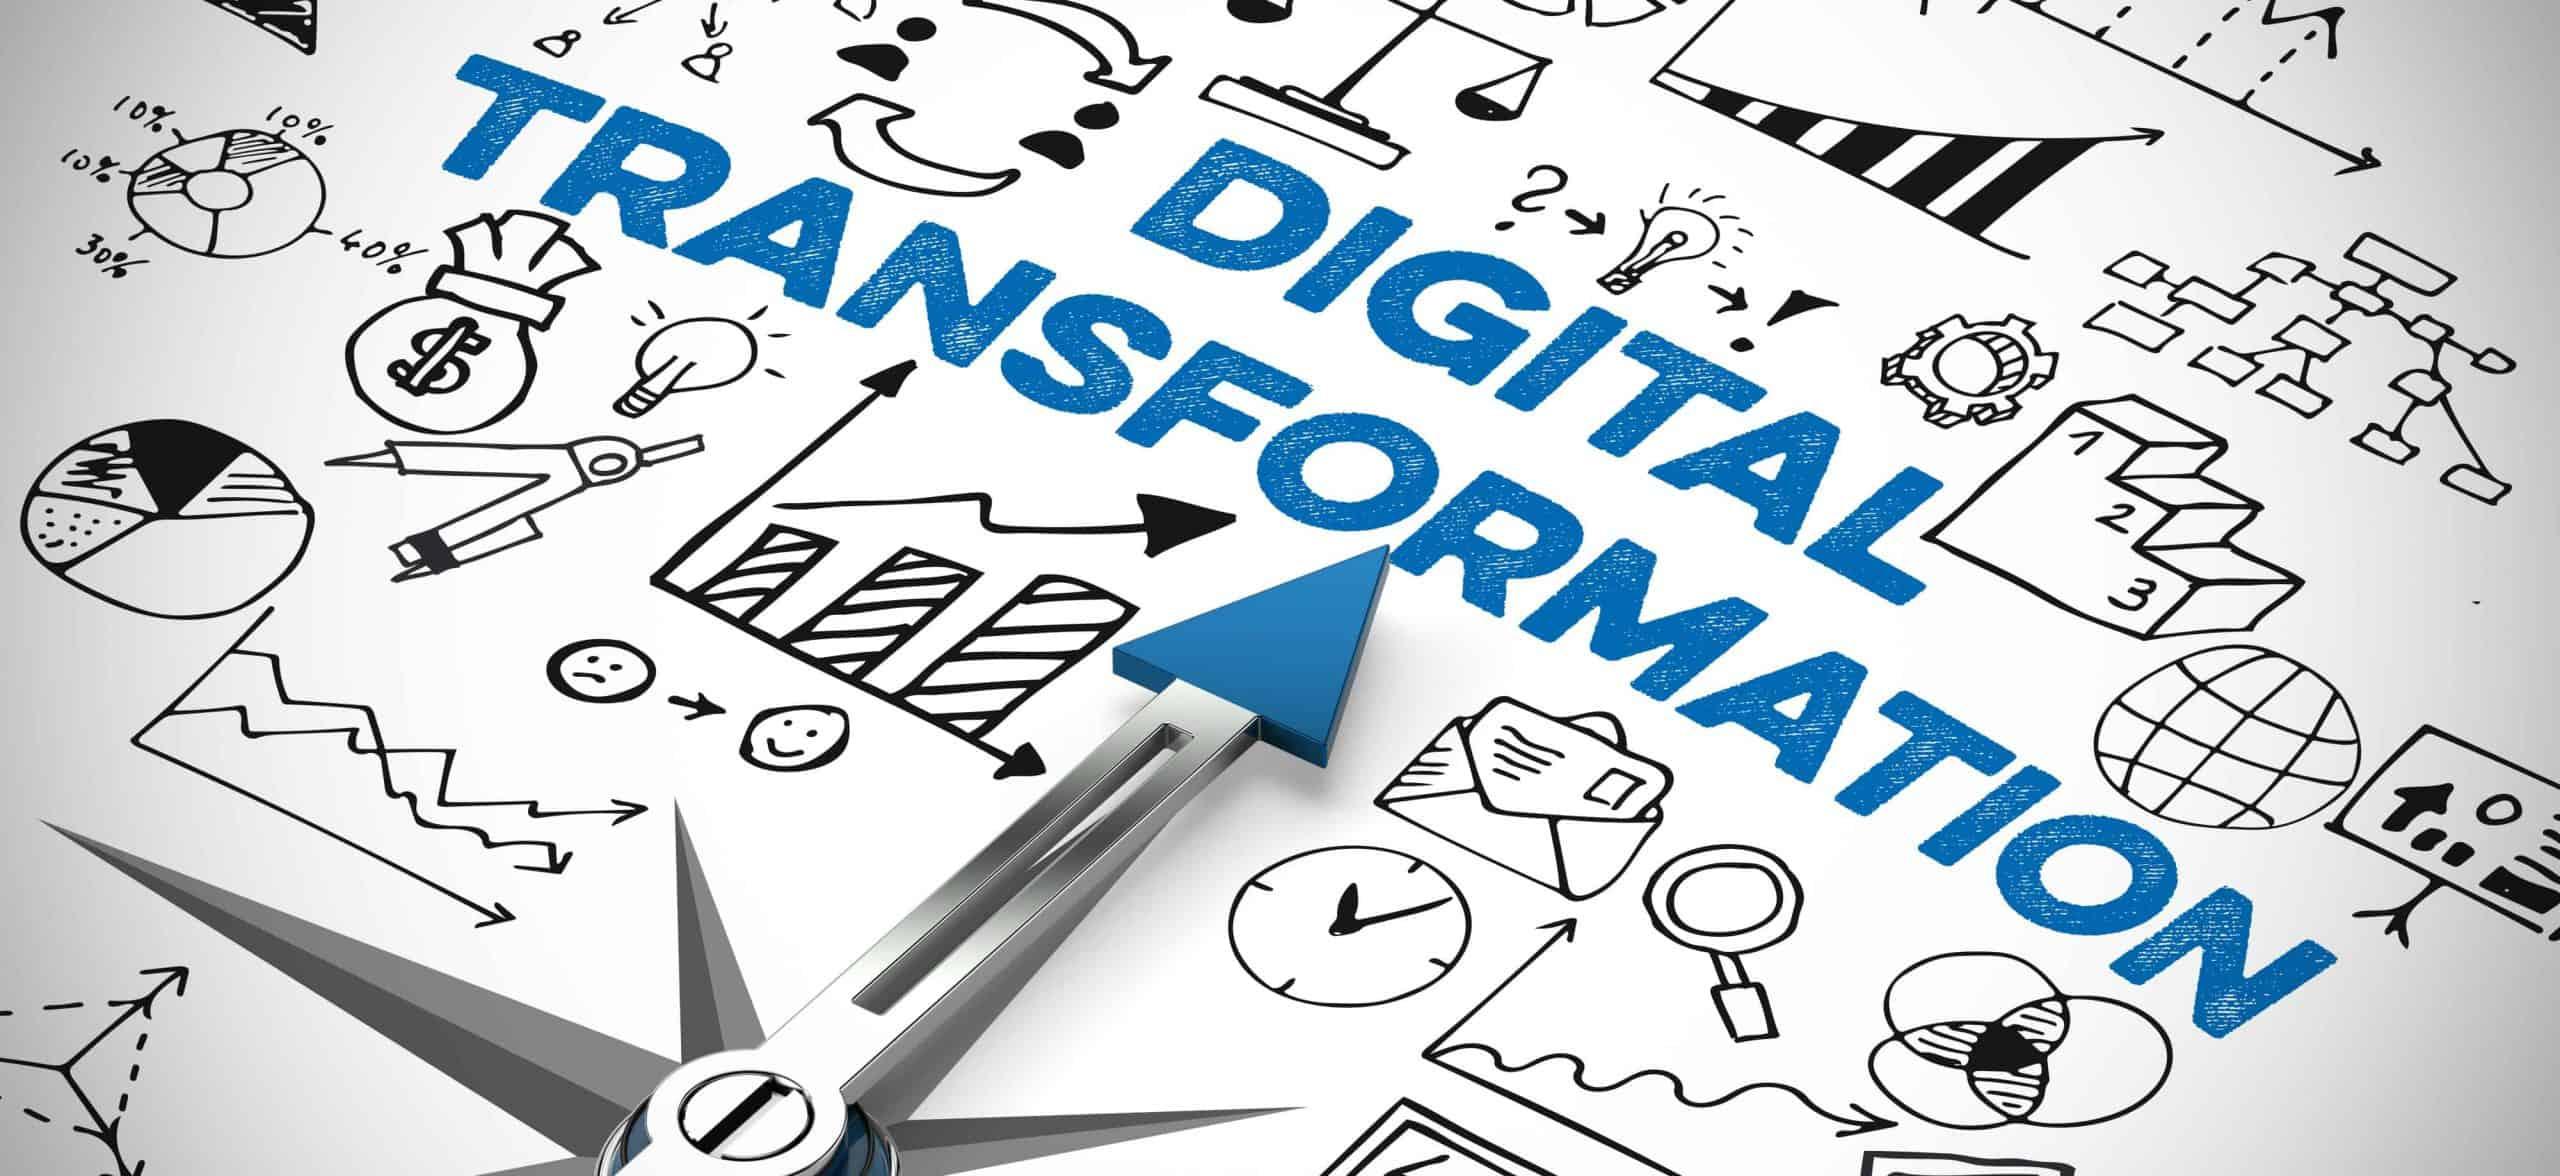 - Enabling the Digital Roadmap for Procurement - Version Three